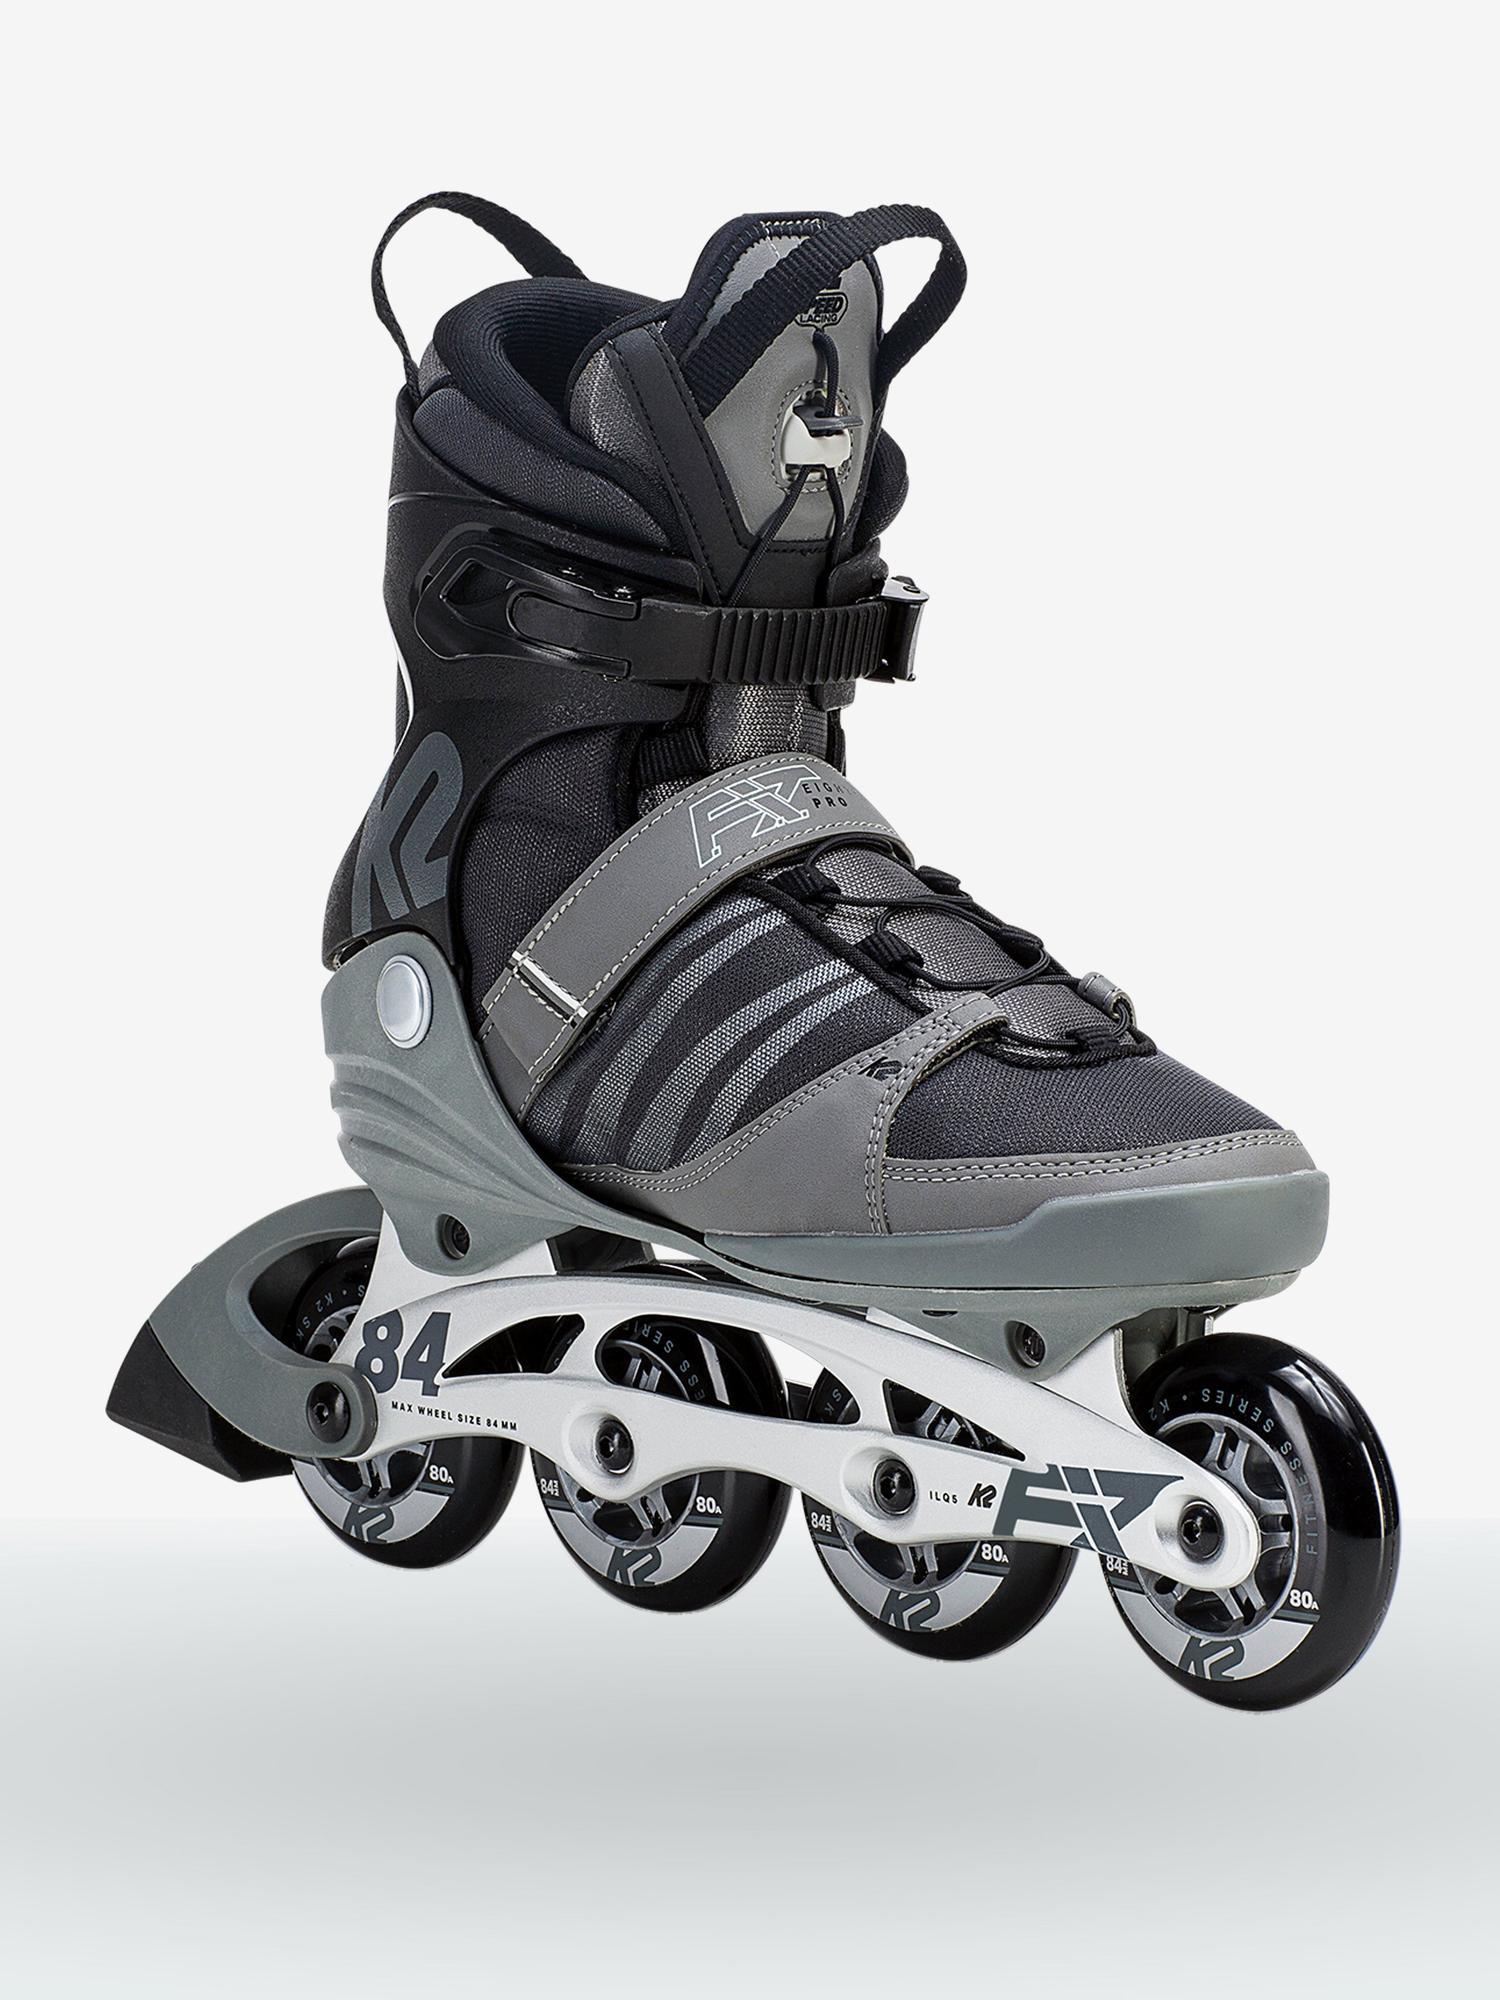 c85d23b823b F.I.T. 84 PRO - K2 Skates | K2 Skates 2019